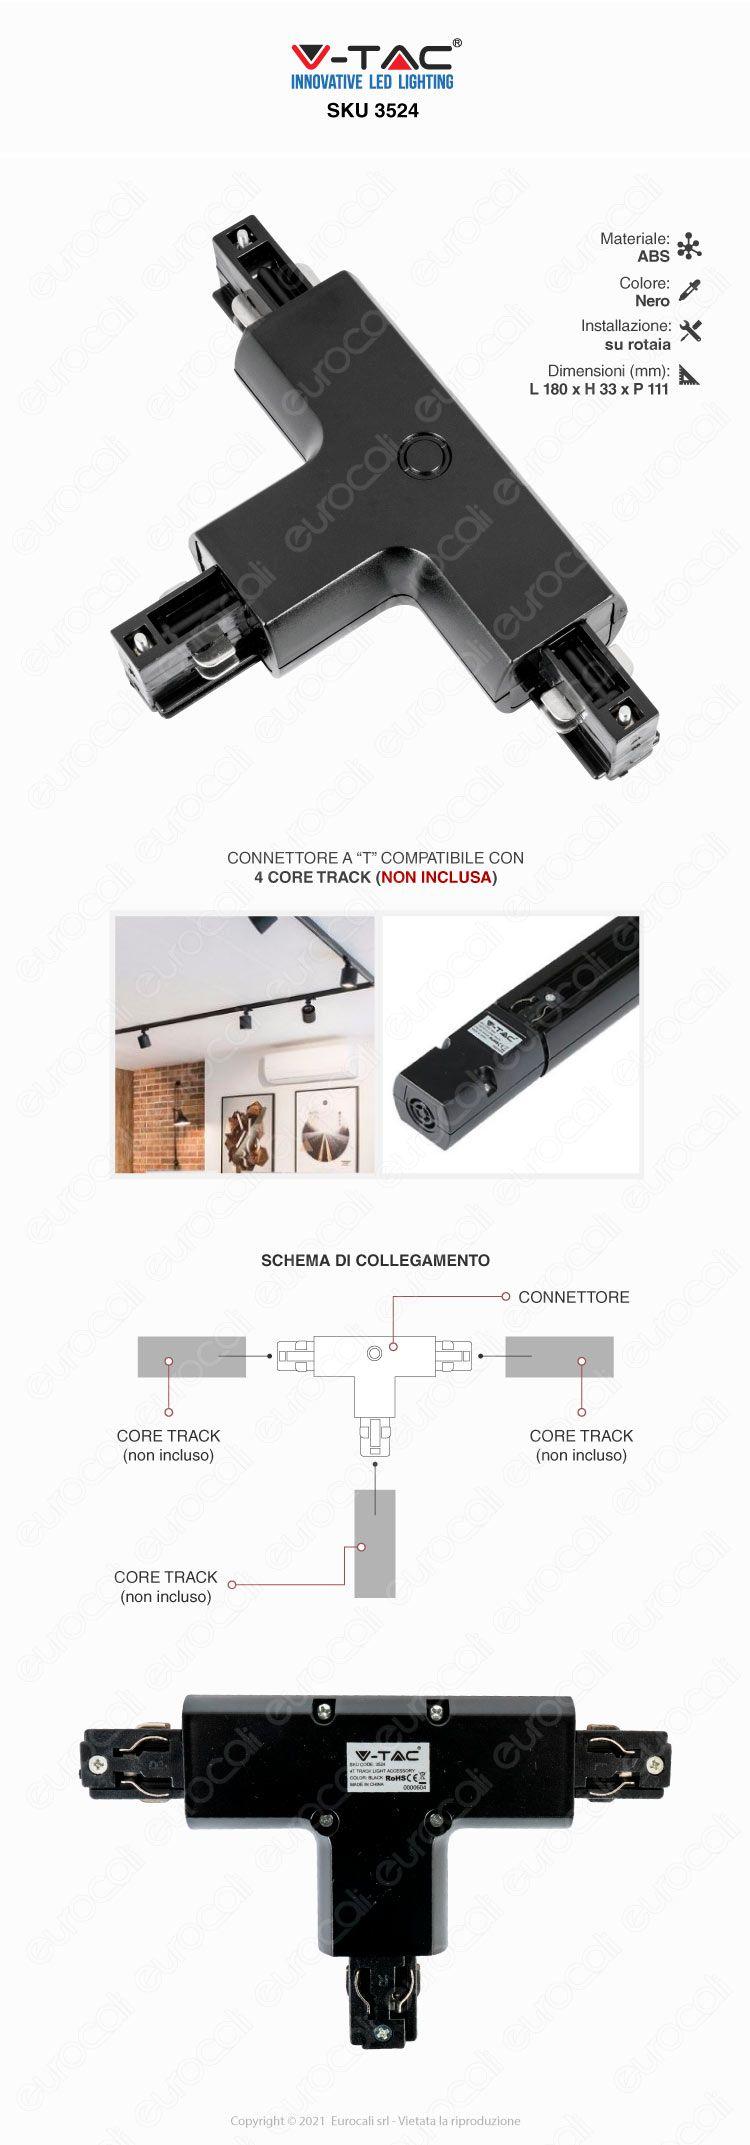 V-Tac connettore nero sku 3524